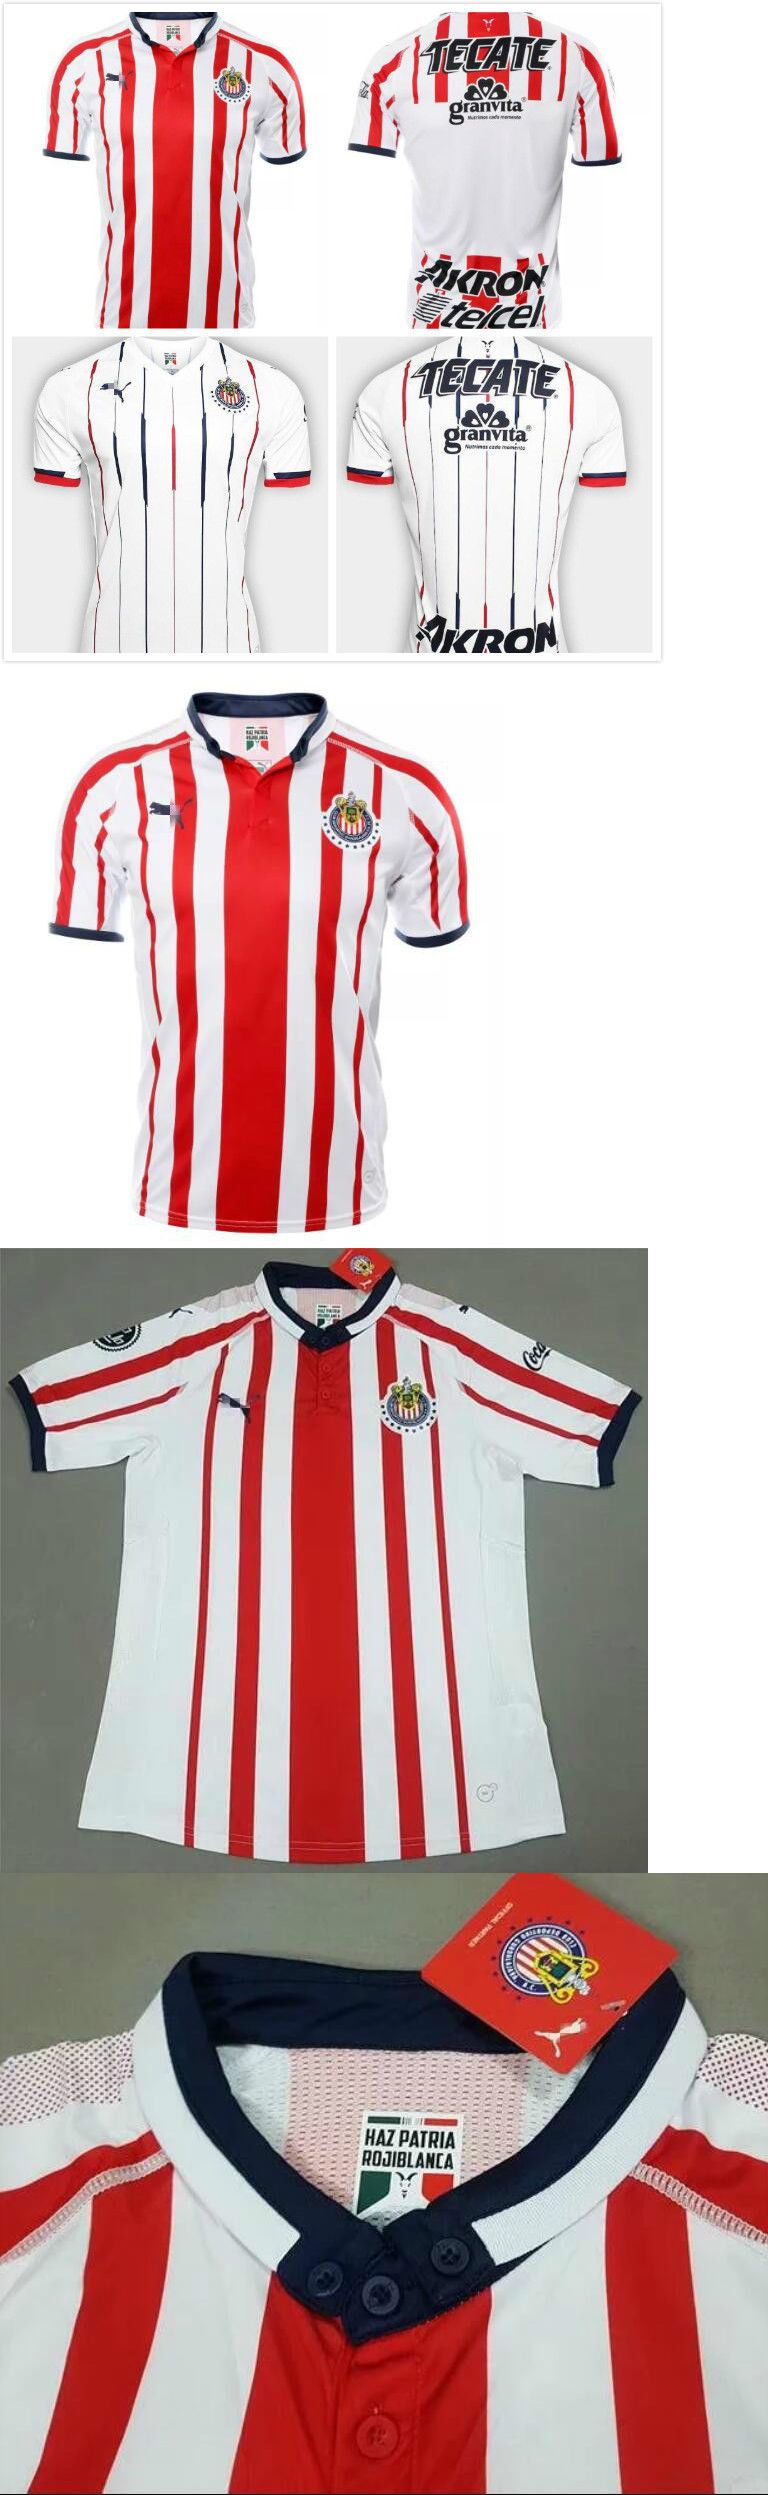 f42b8f215b24 ... inexpensive clothing 33485 new 2018 19 chivas guadalajara home away soccer  jersey short sleeve t shirt